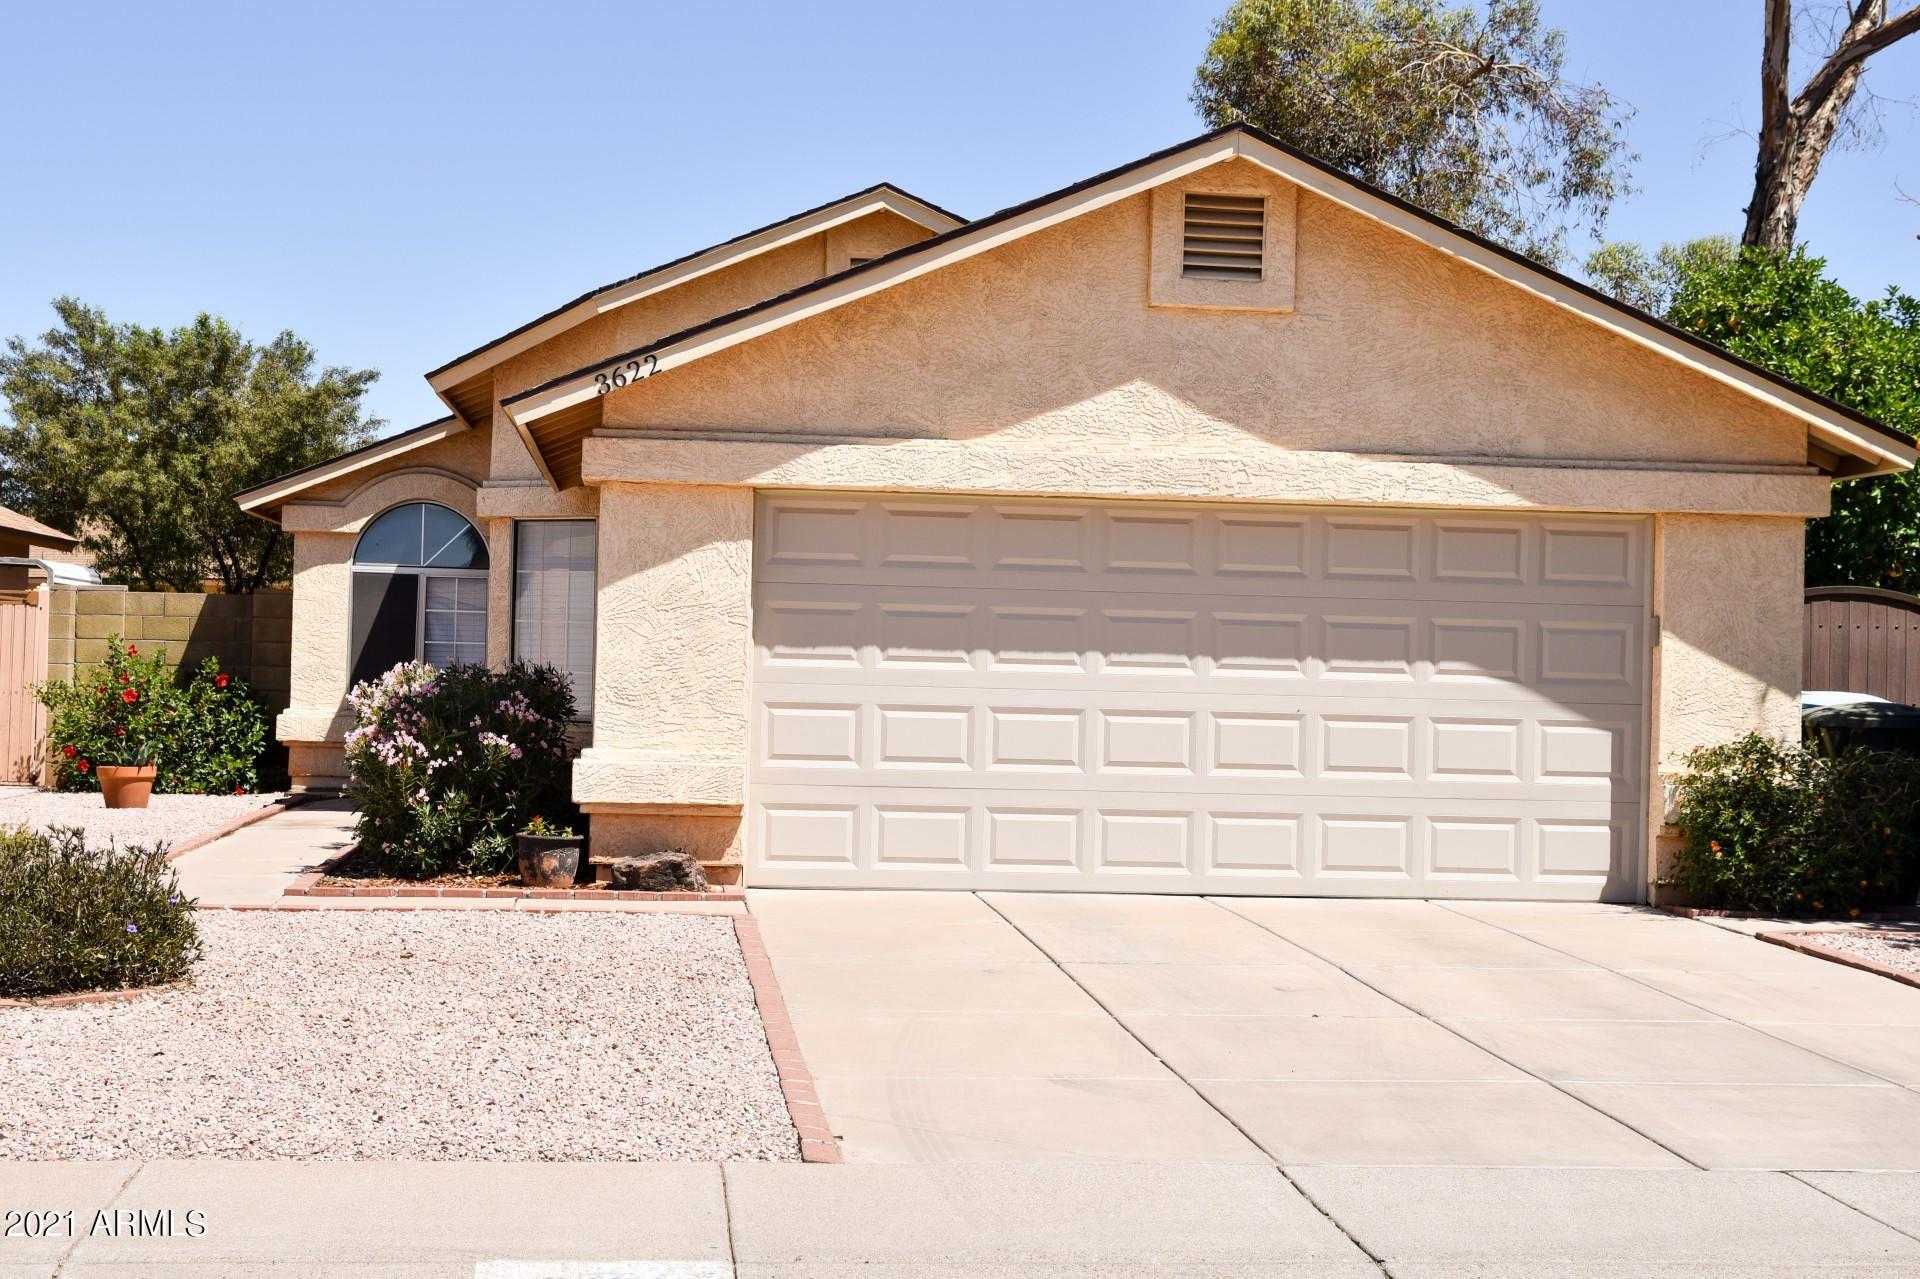 Photo of 3622 W MARCO POLO Road, Glendale, AZ 85308 (MLS # 6232527)